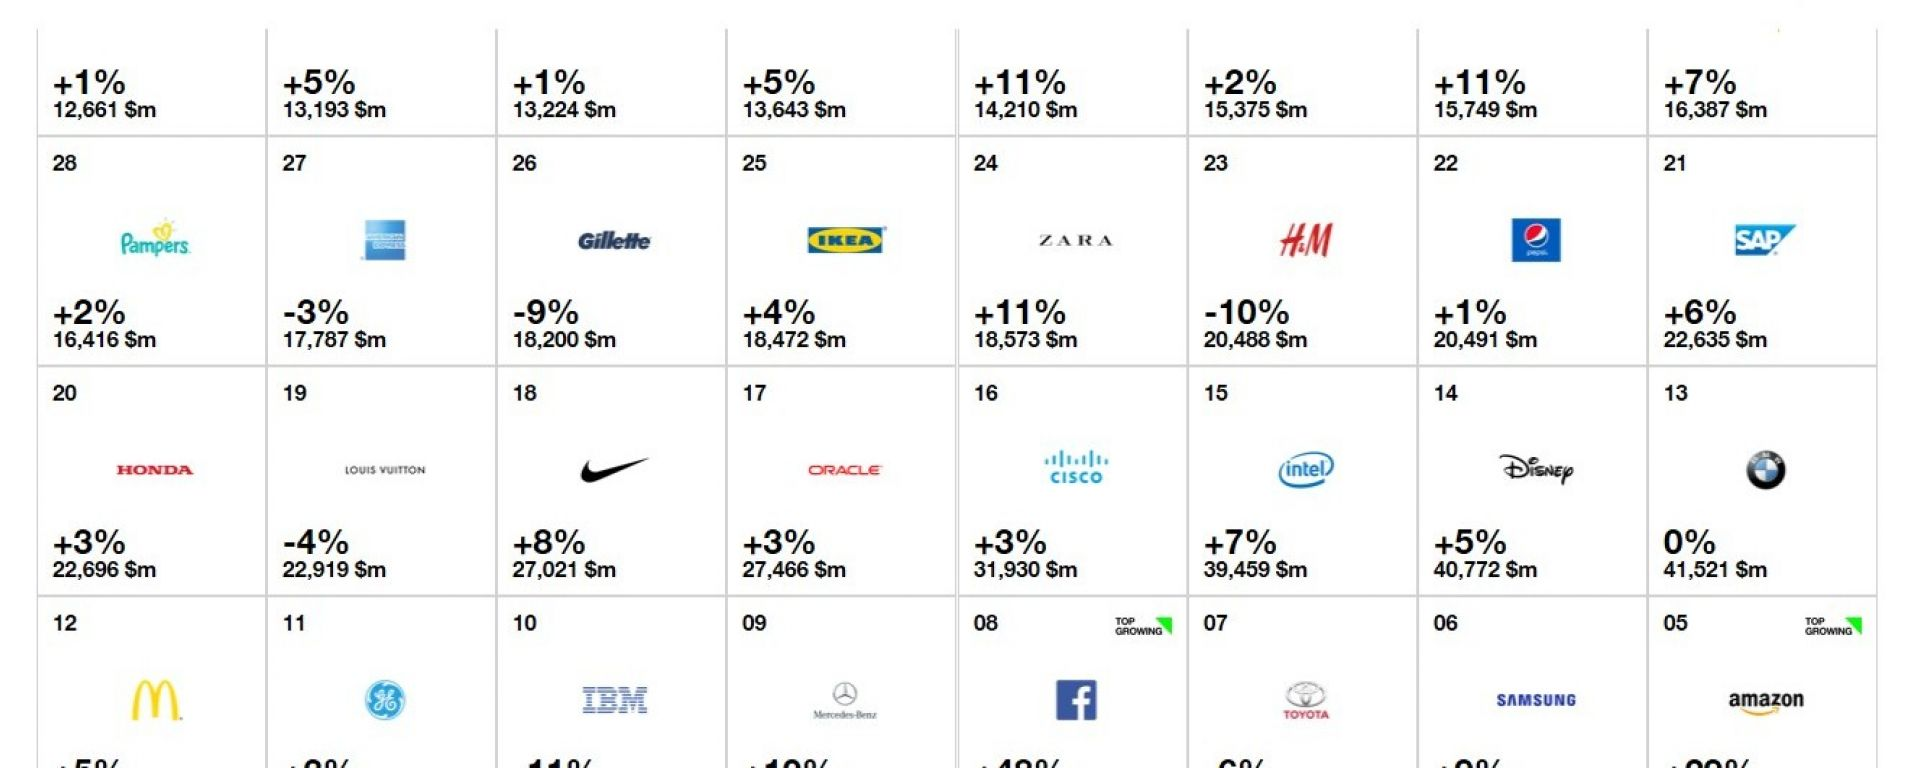 Interbrand: Best Global Brands 2017   Ranking